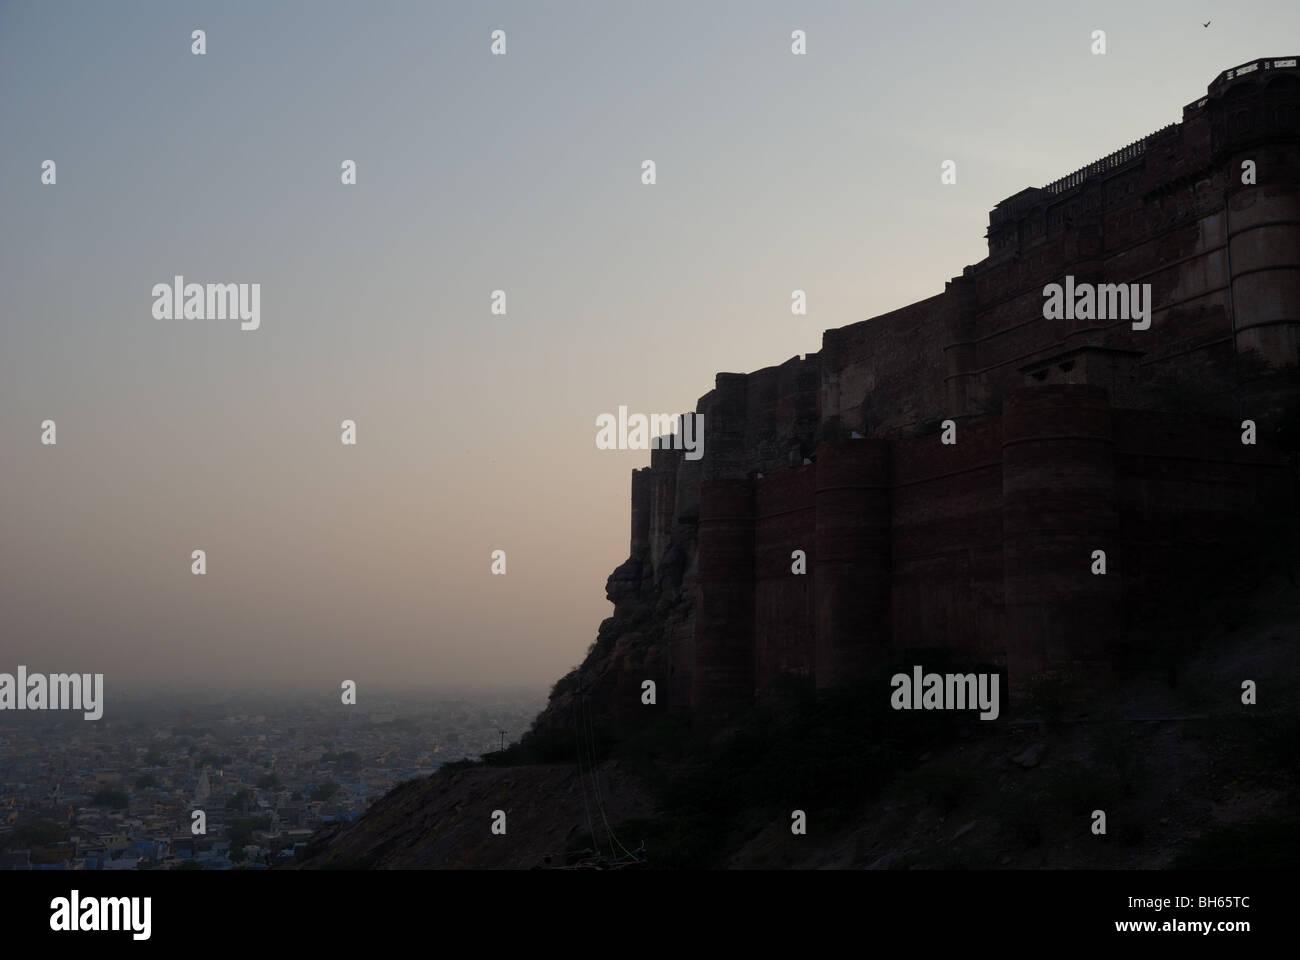 Silhouette of Mehrangarh Fort  with Jodhpur bellow. India. - Stock Image